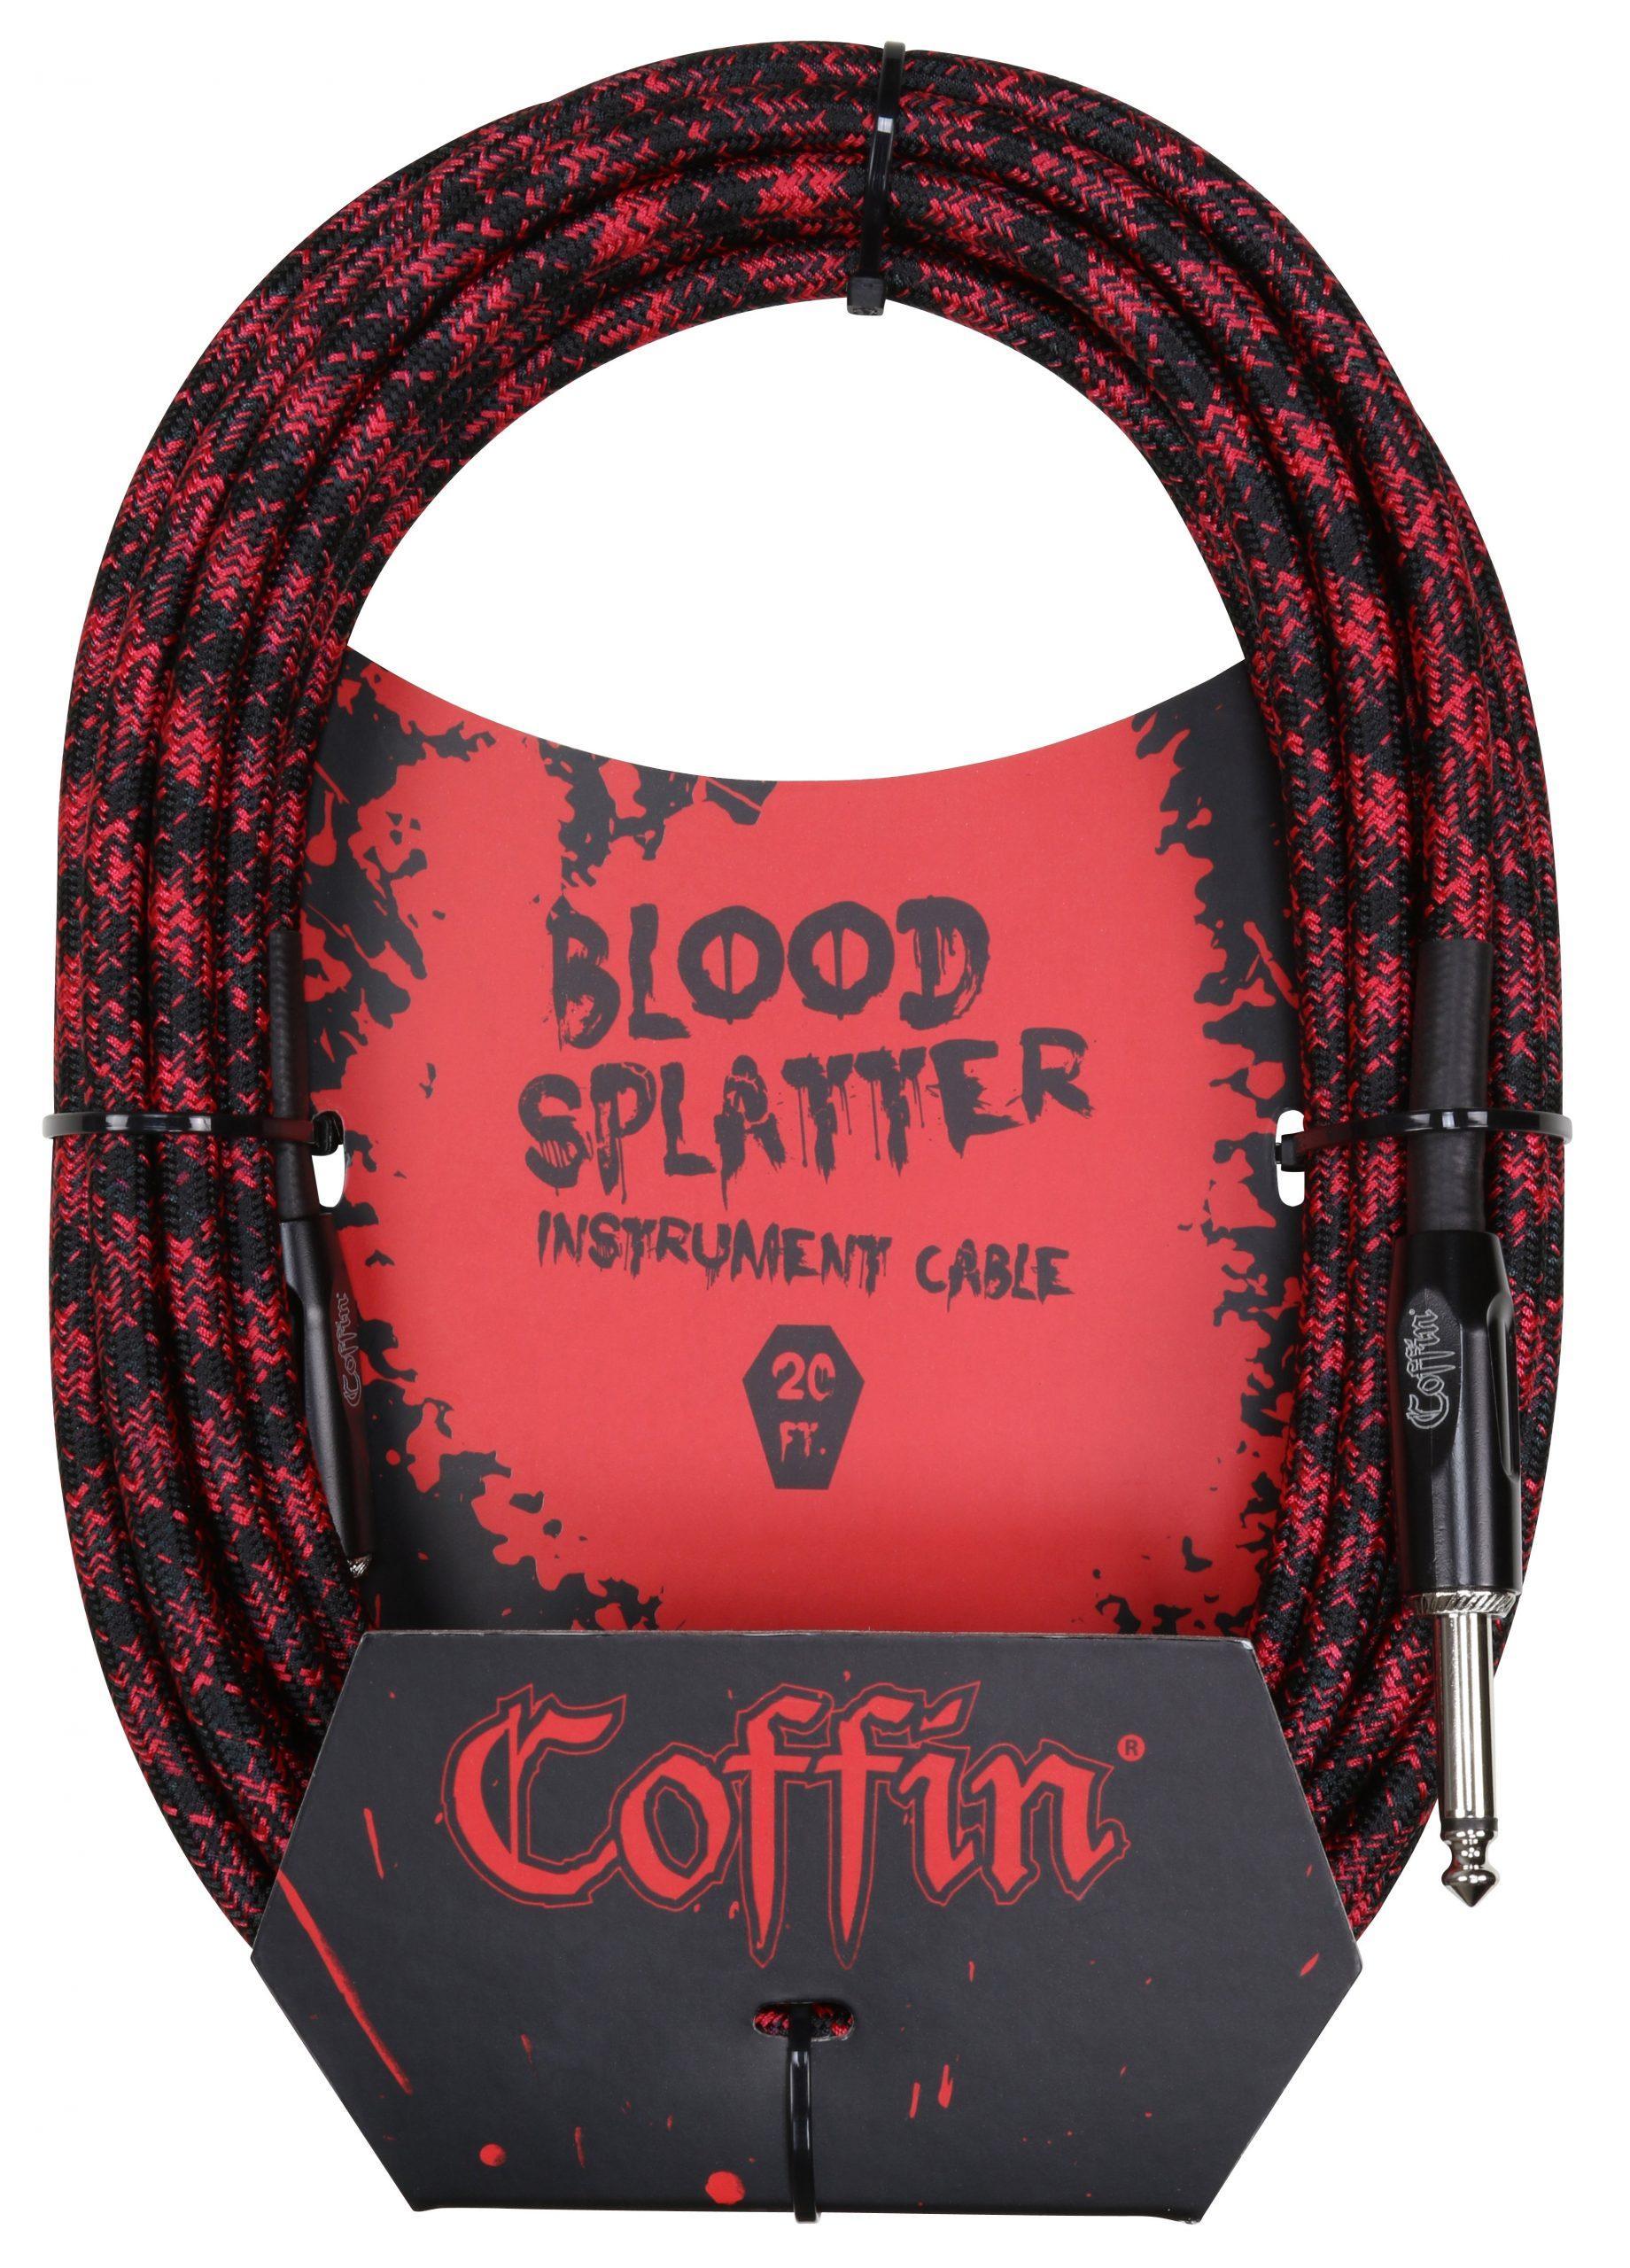 Bloodsplatter Instrument Cable 20ft. Straight